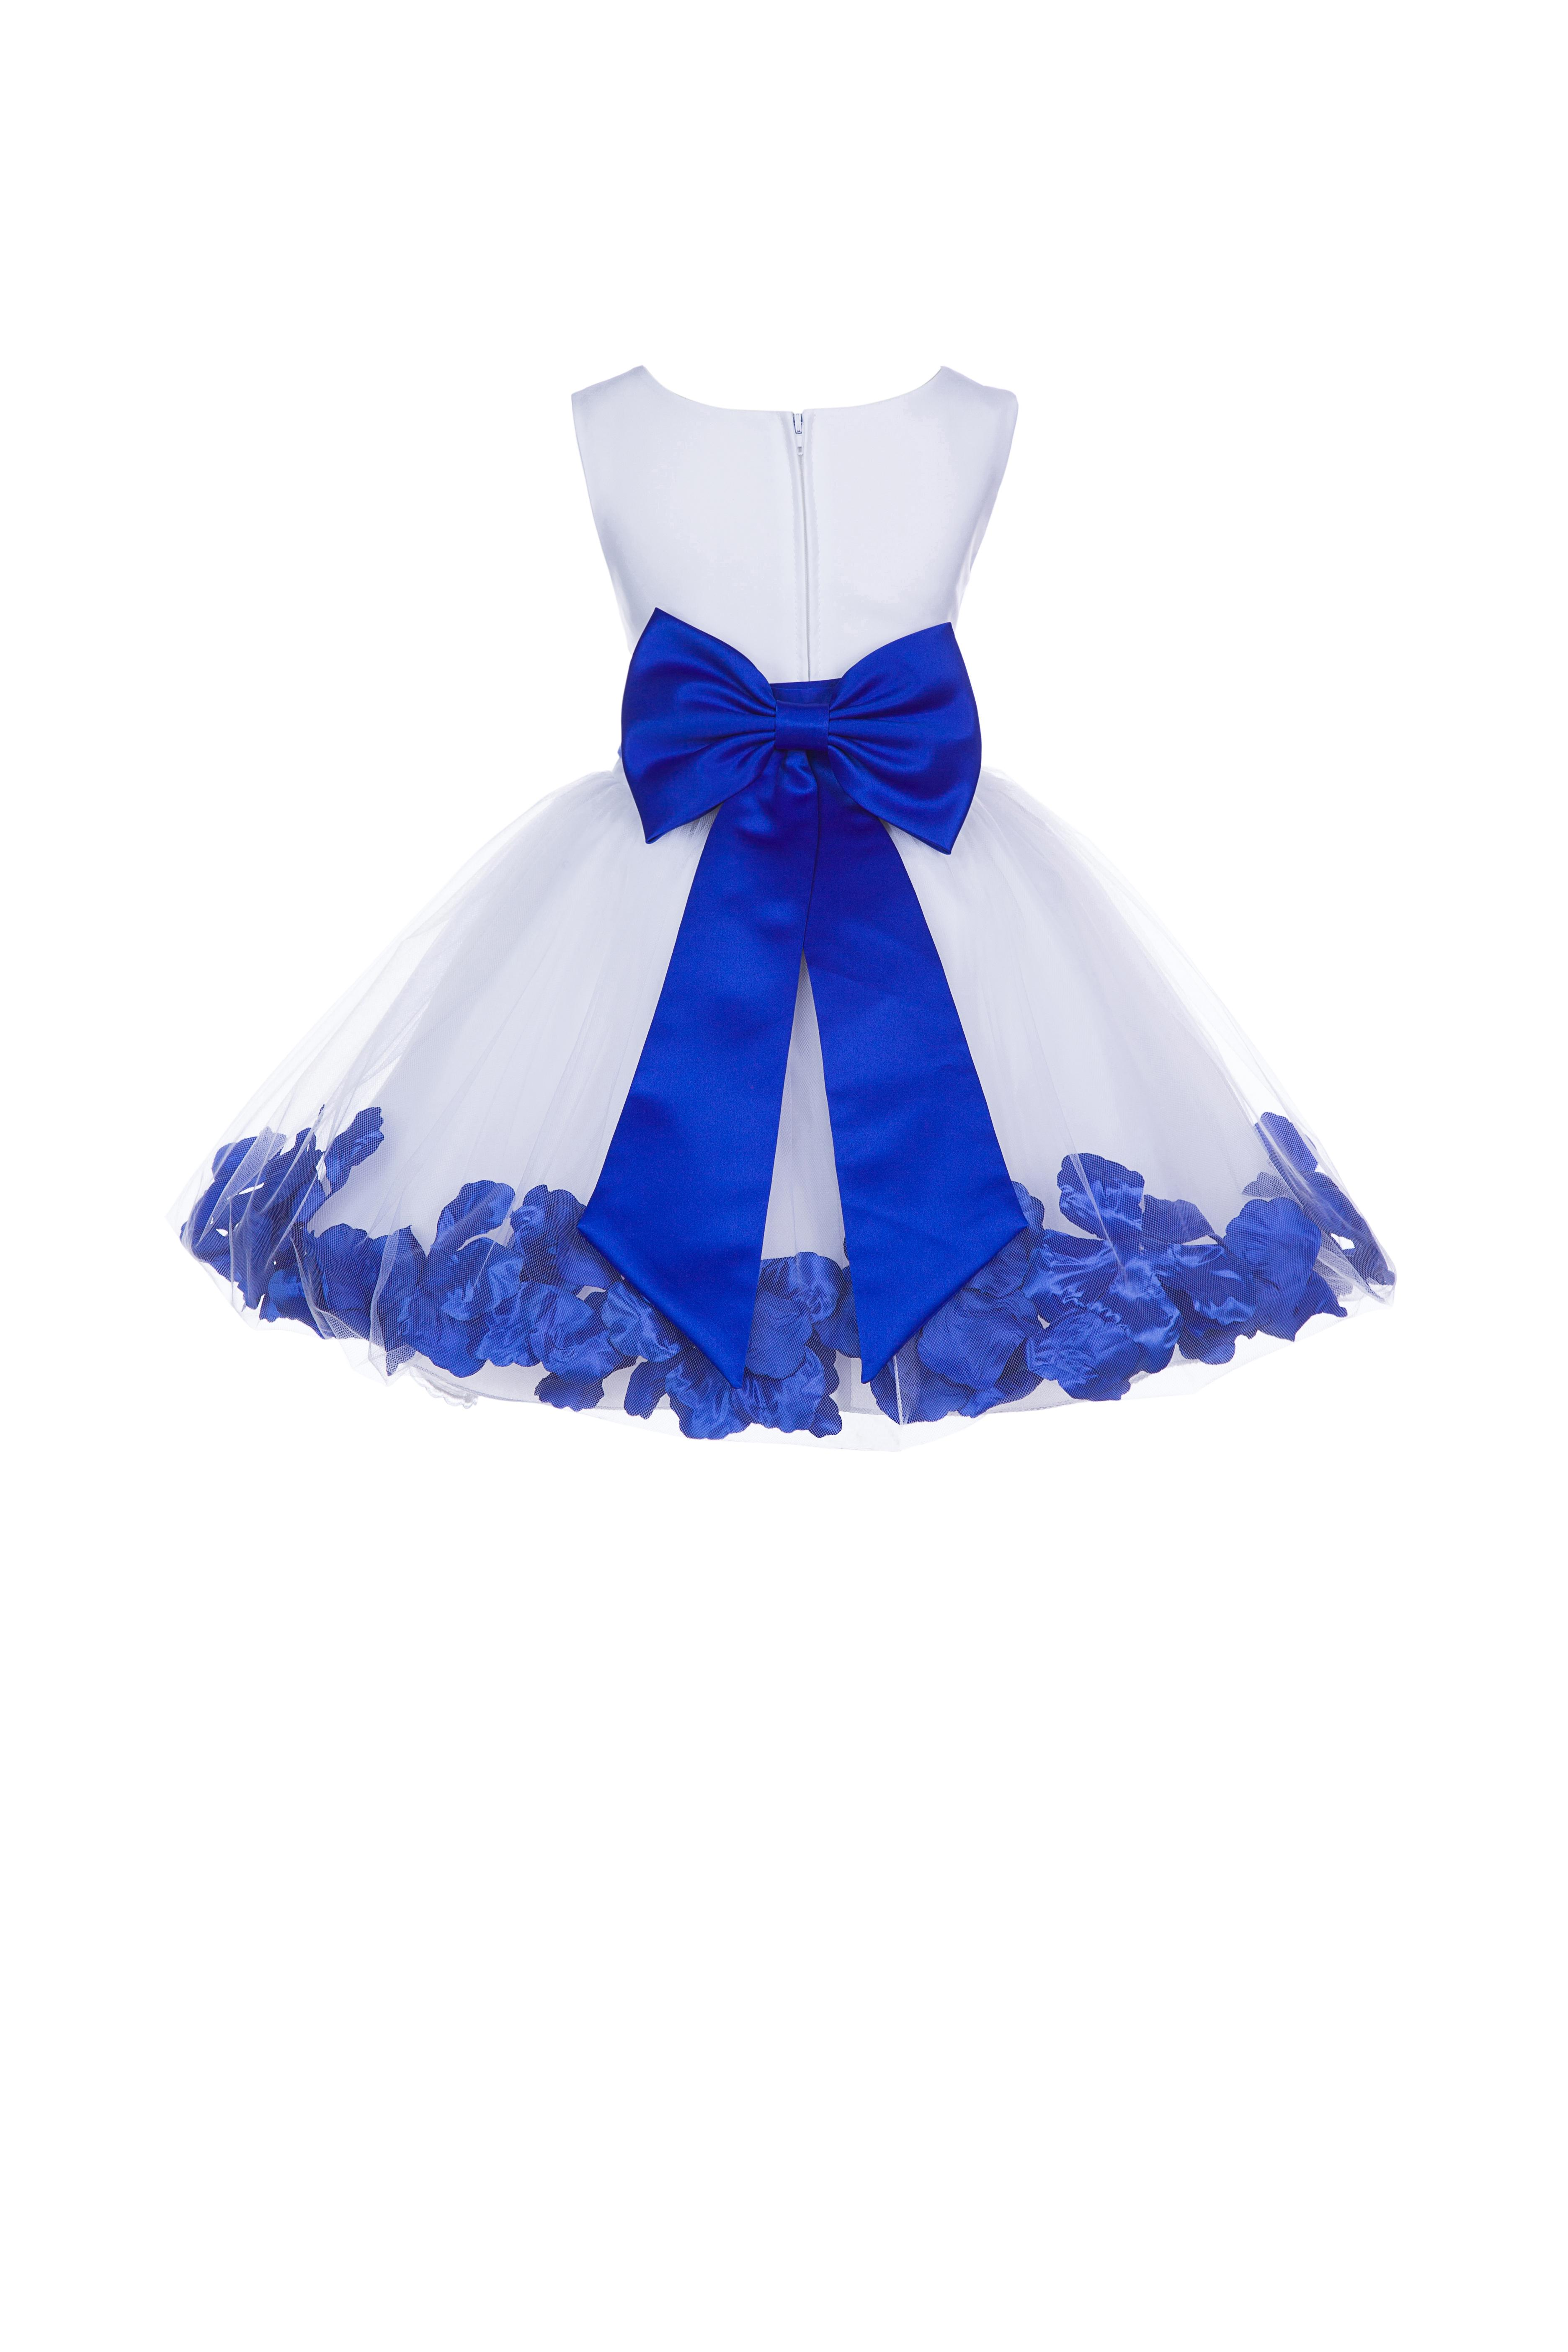 Ekidsbridal Formal Satin Floral Rose Petals Tulle White Flower Girl Dress Bridesmaid...